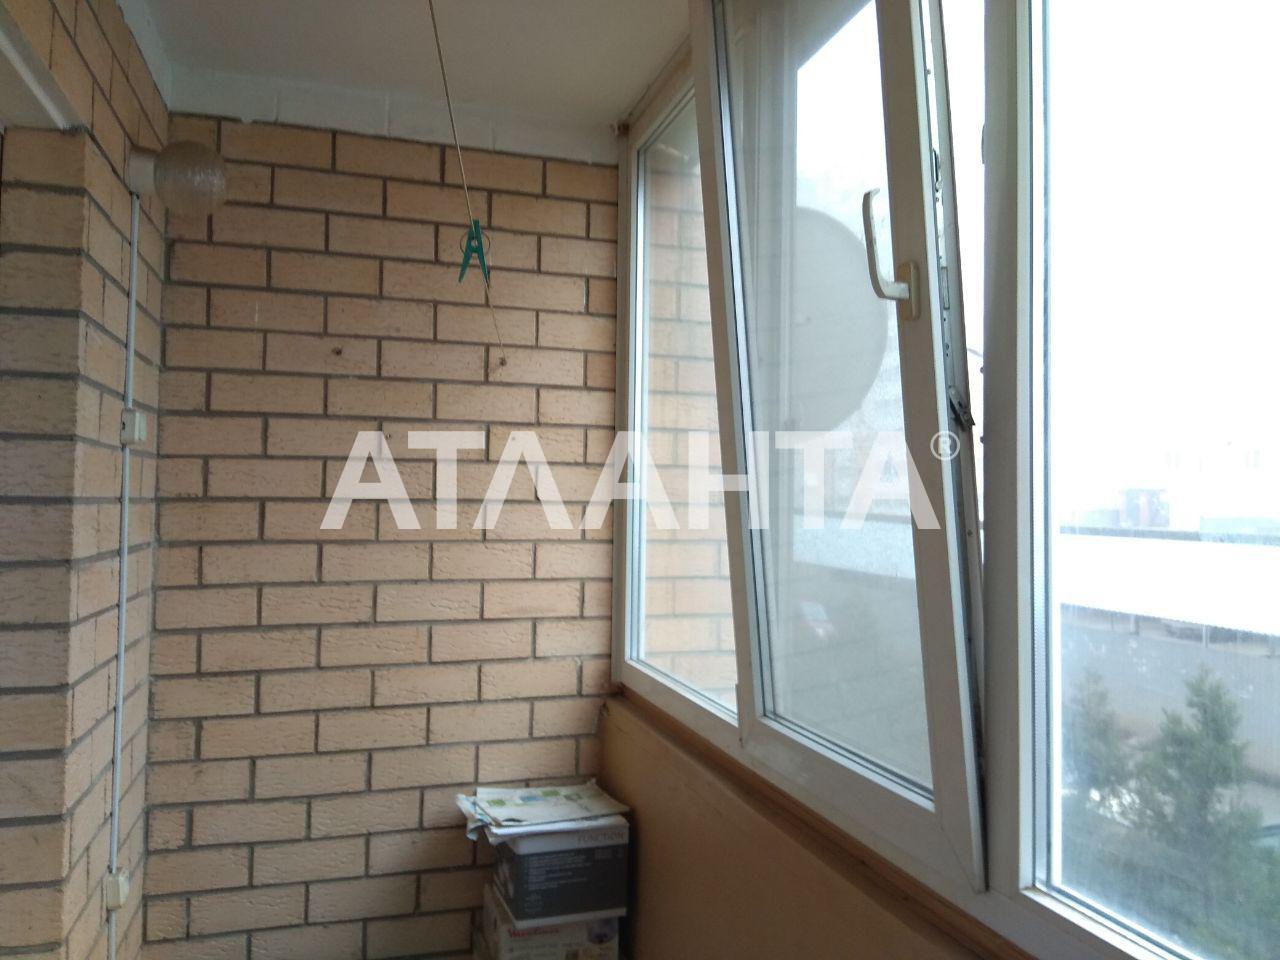 Продается 1-комнатная Квартира на ул. Радужный М-Н — 32 000 у.е. (фото №3)